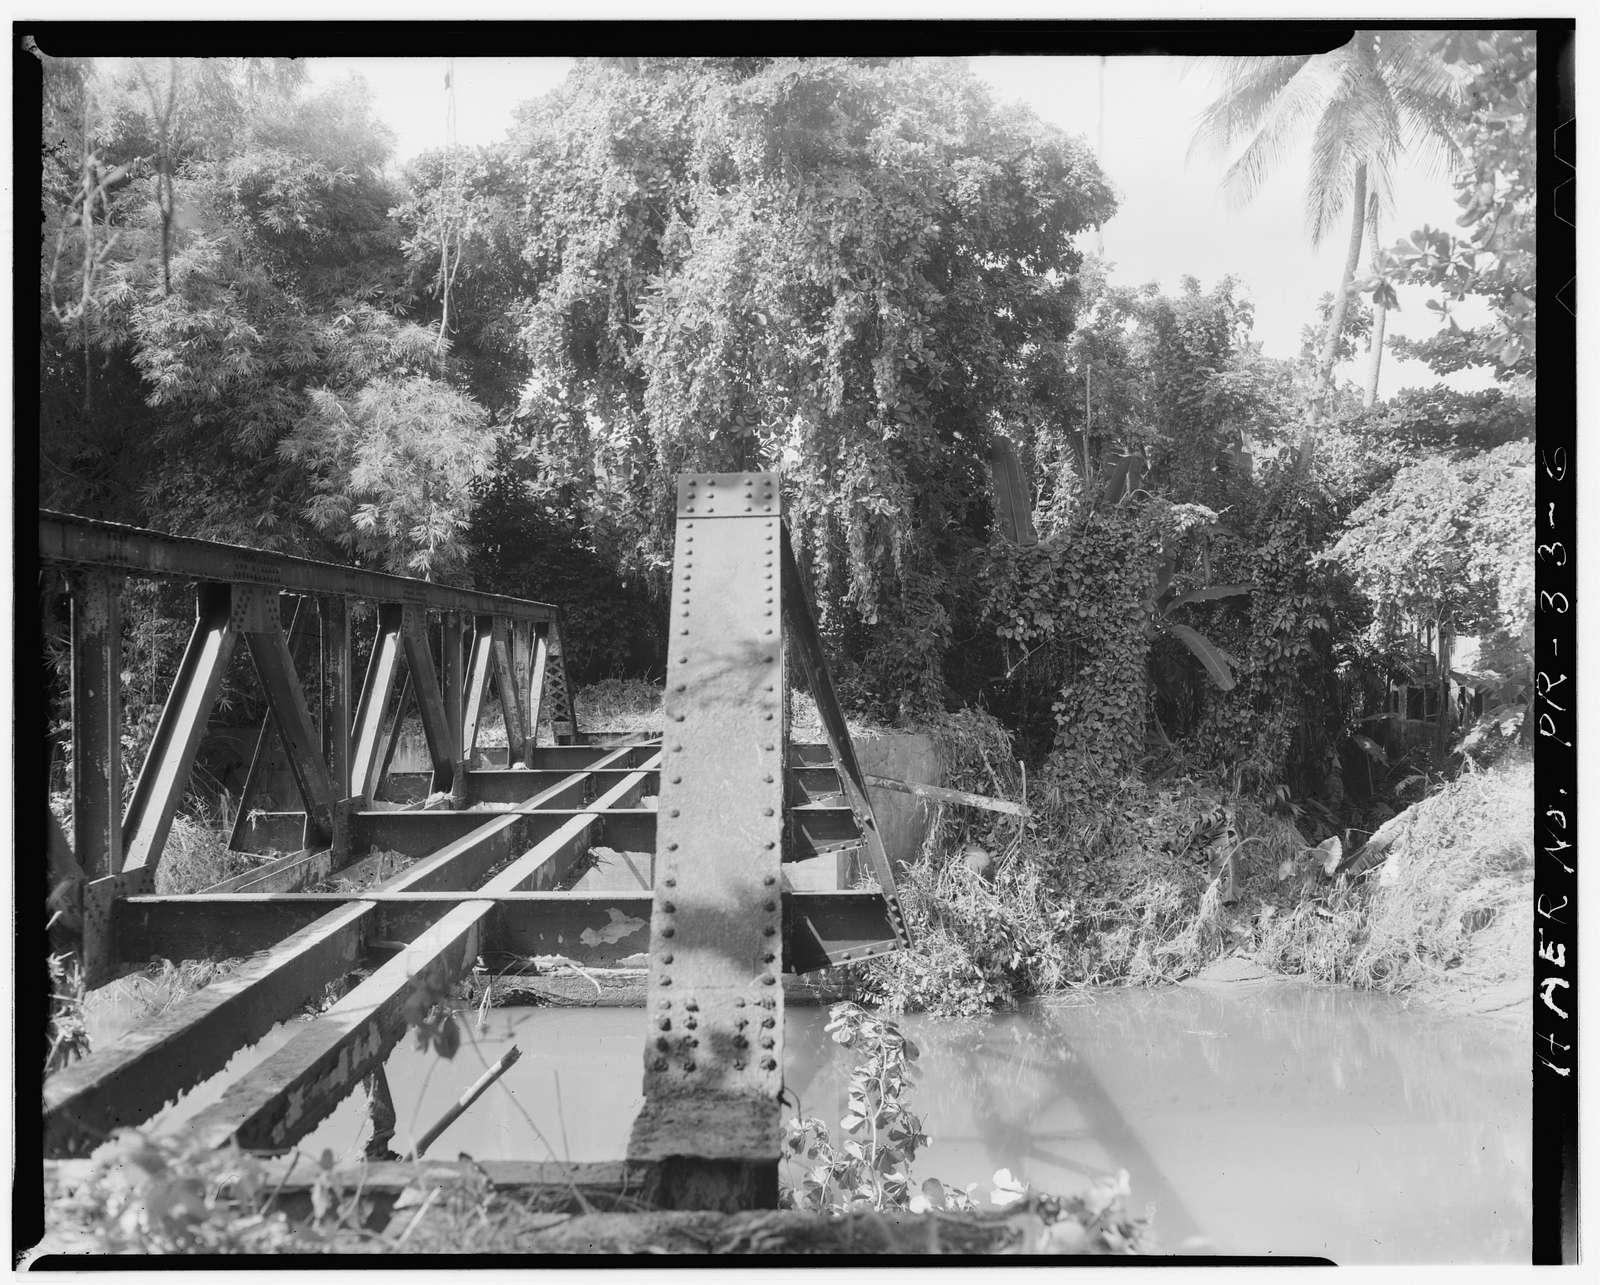 Batey Columbia Railroad Bridge, Spanning Maunabo River, Maunabo, Maunabo Municipio, PR